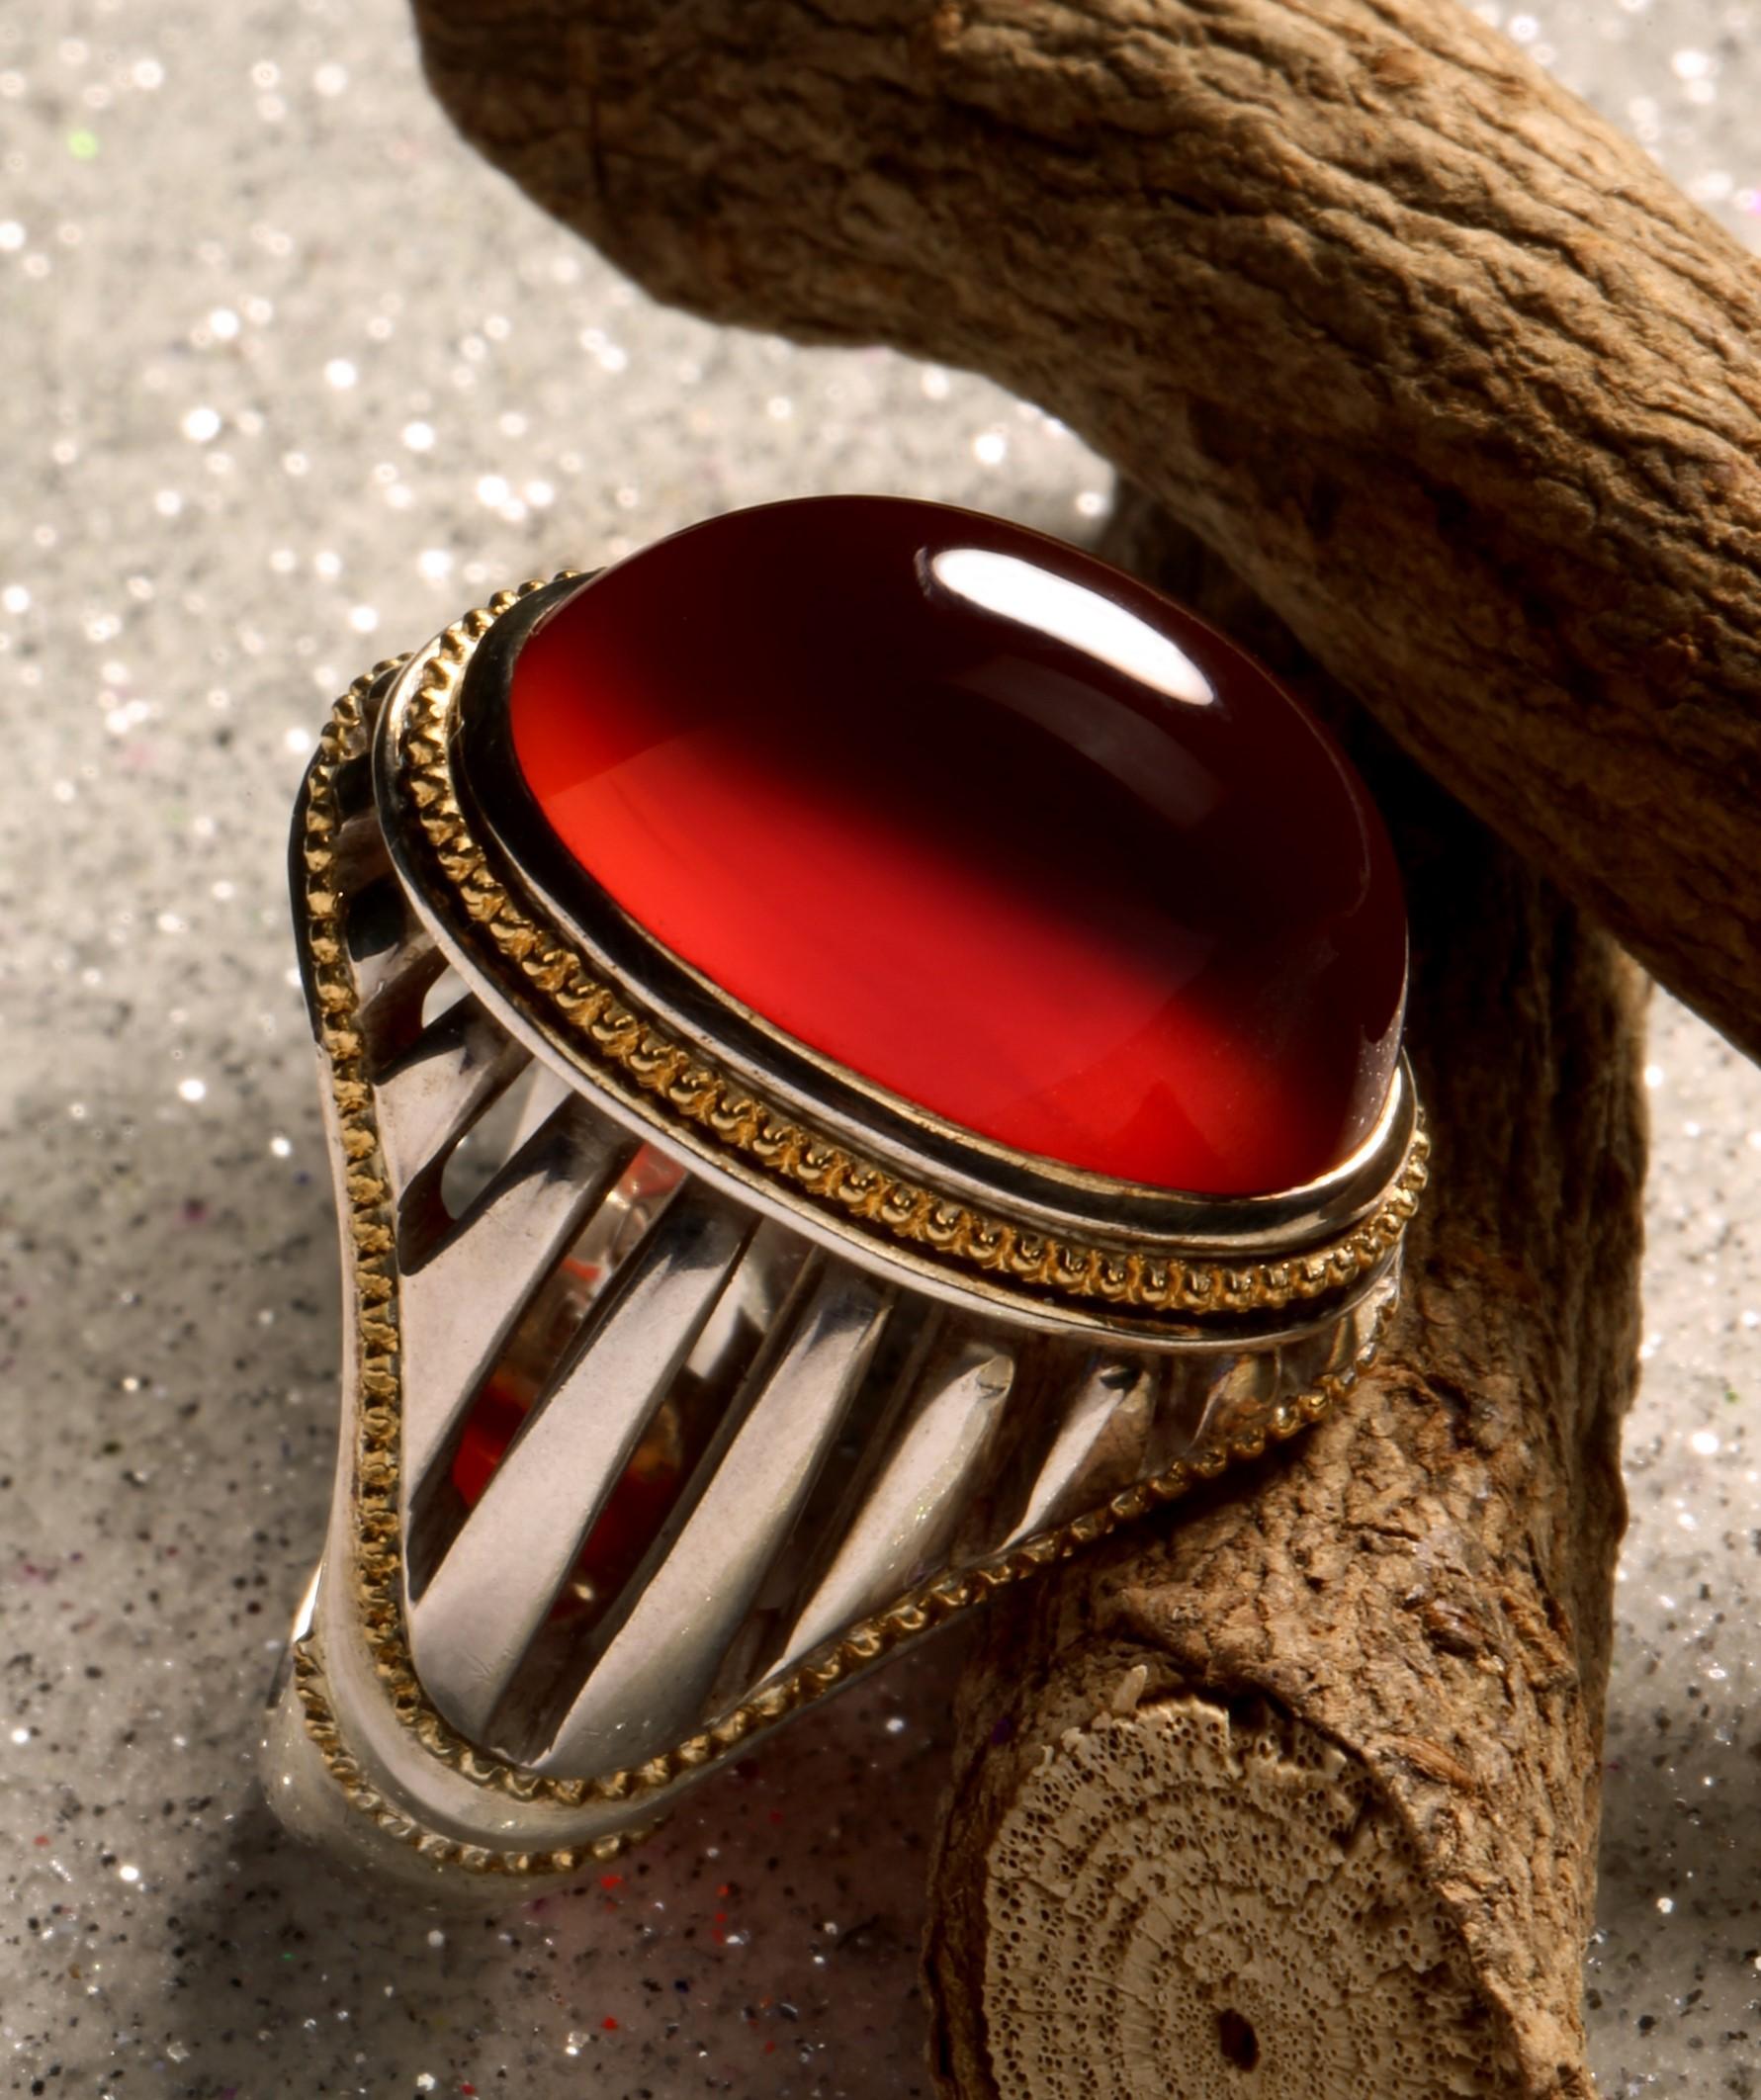 A-1507 انگشتر عقیق سرخ یمنی کهنه با پایه فدیوم